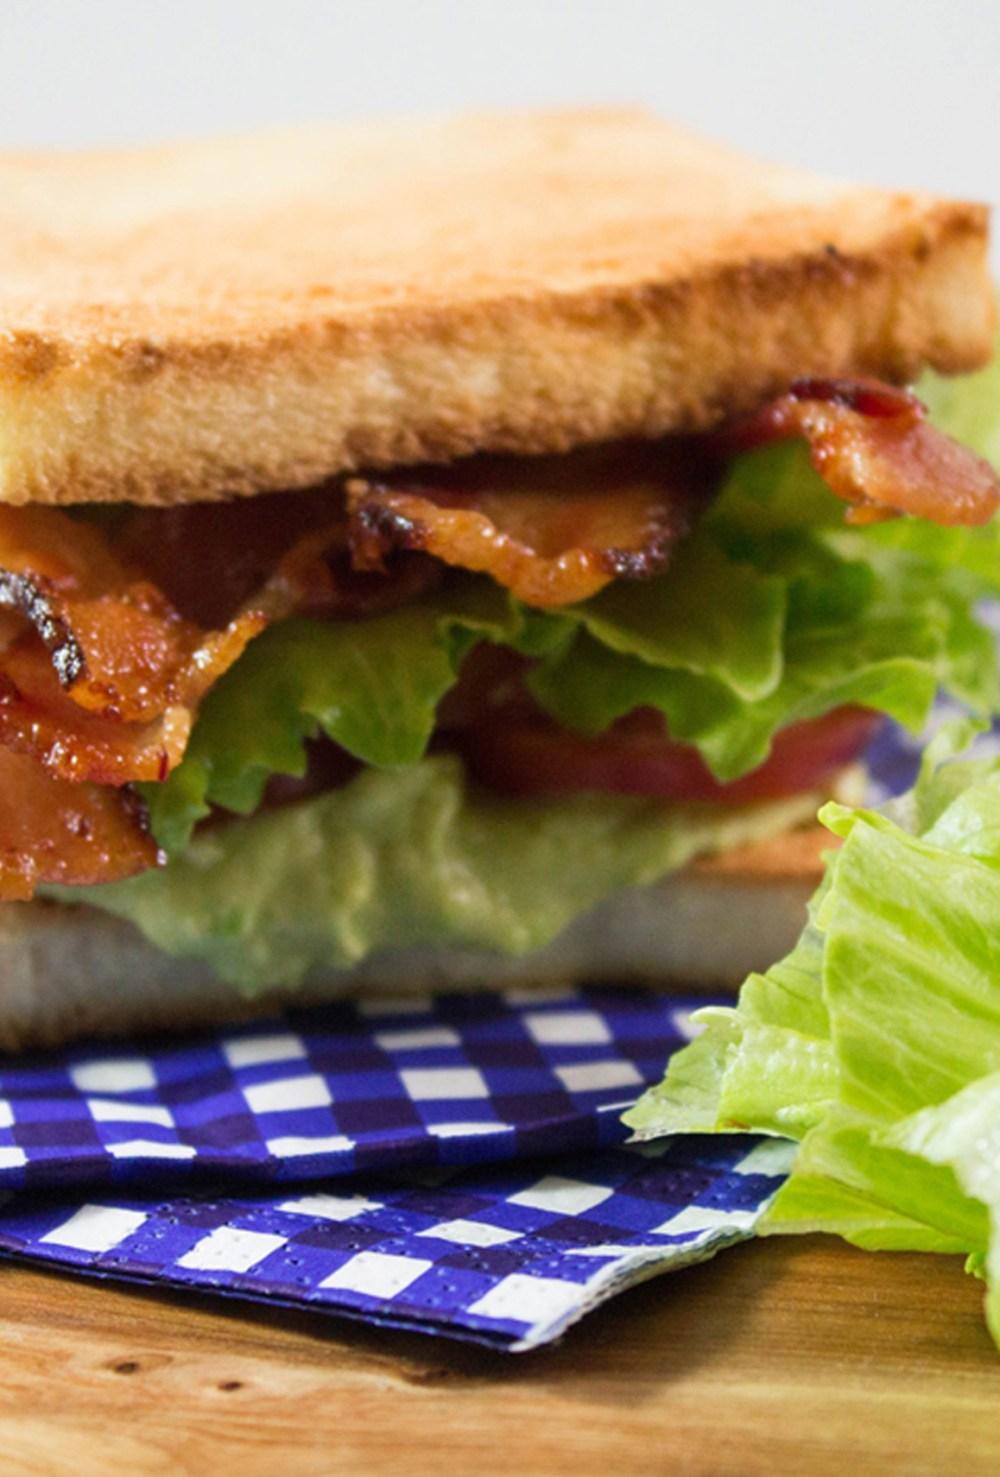 Sanduiche de Bacon alface abacate e tomate